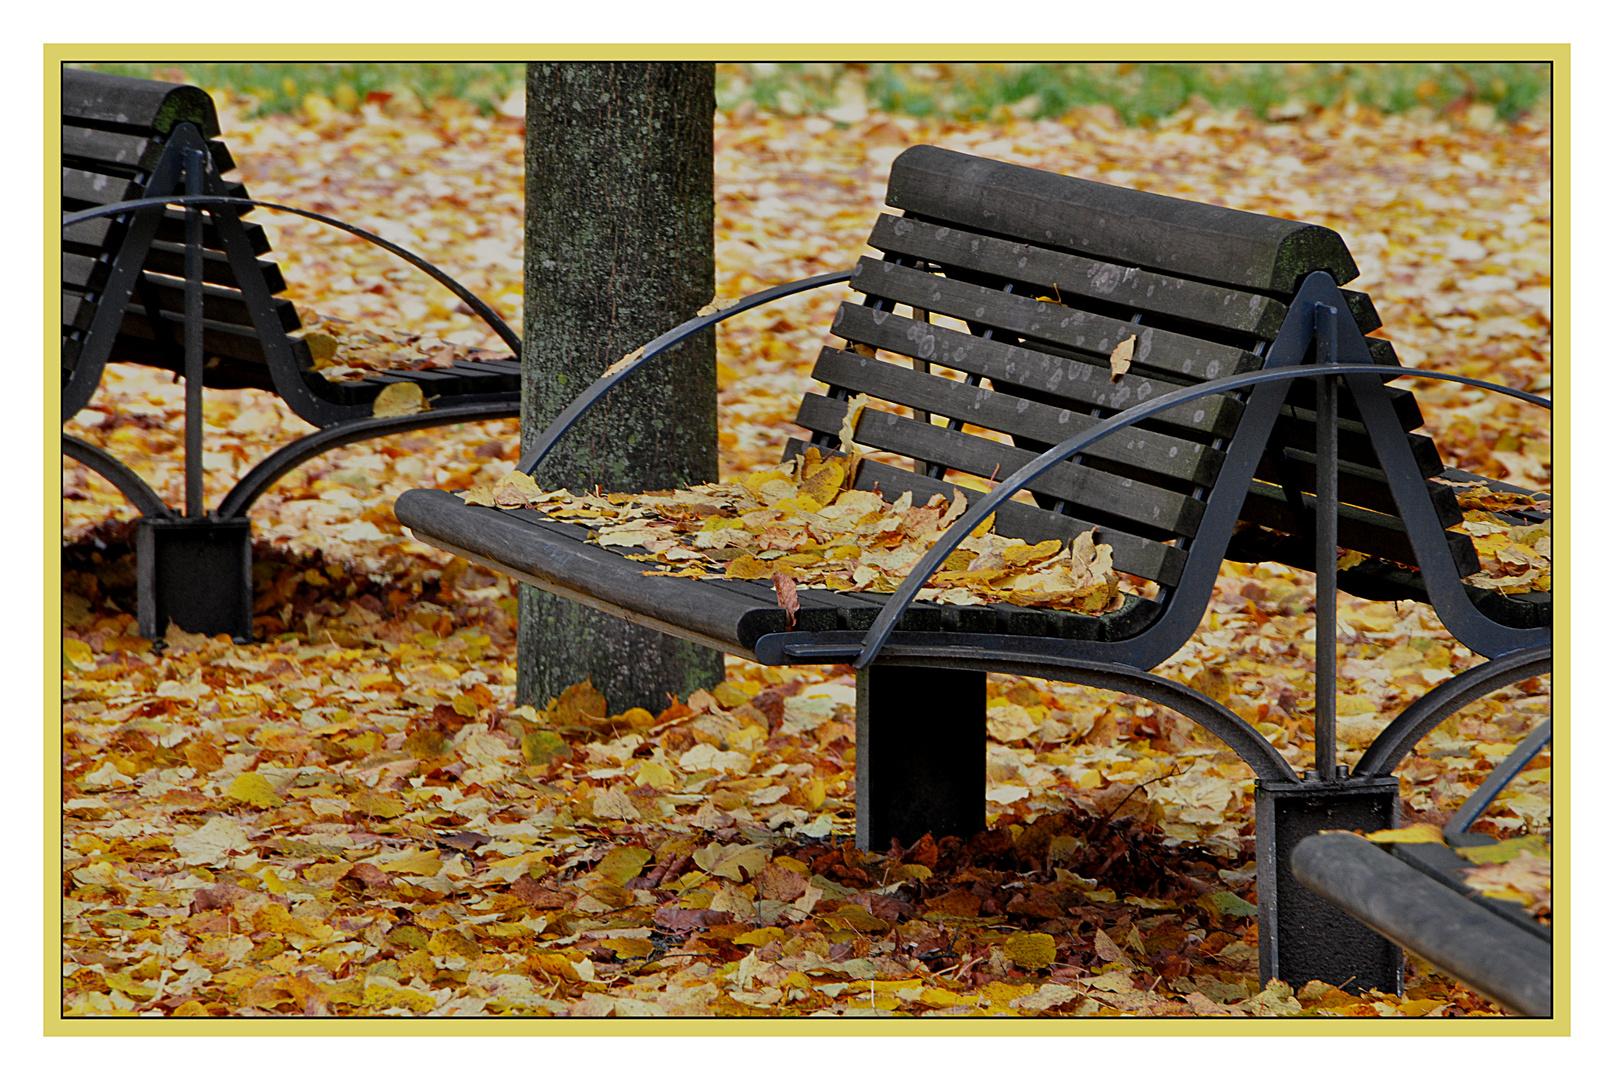 Herbstruhe ....